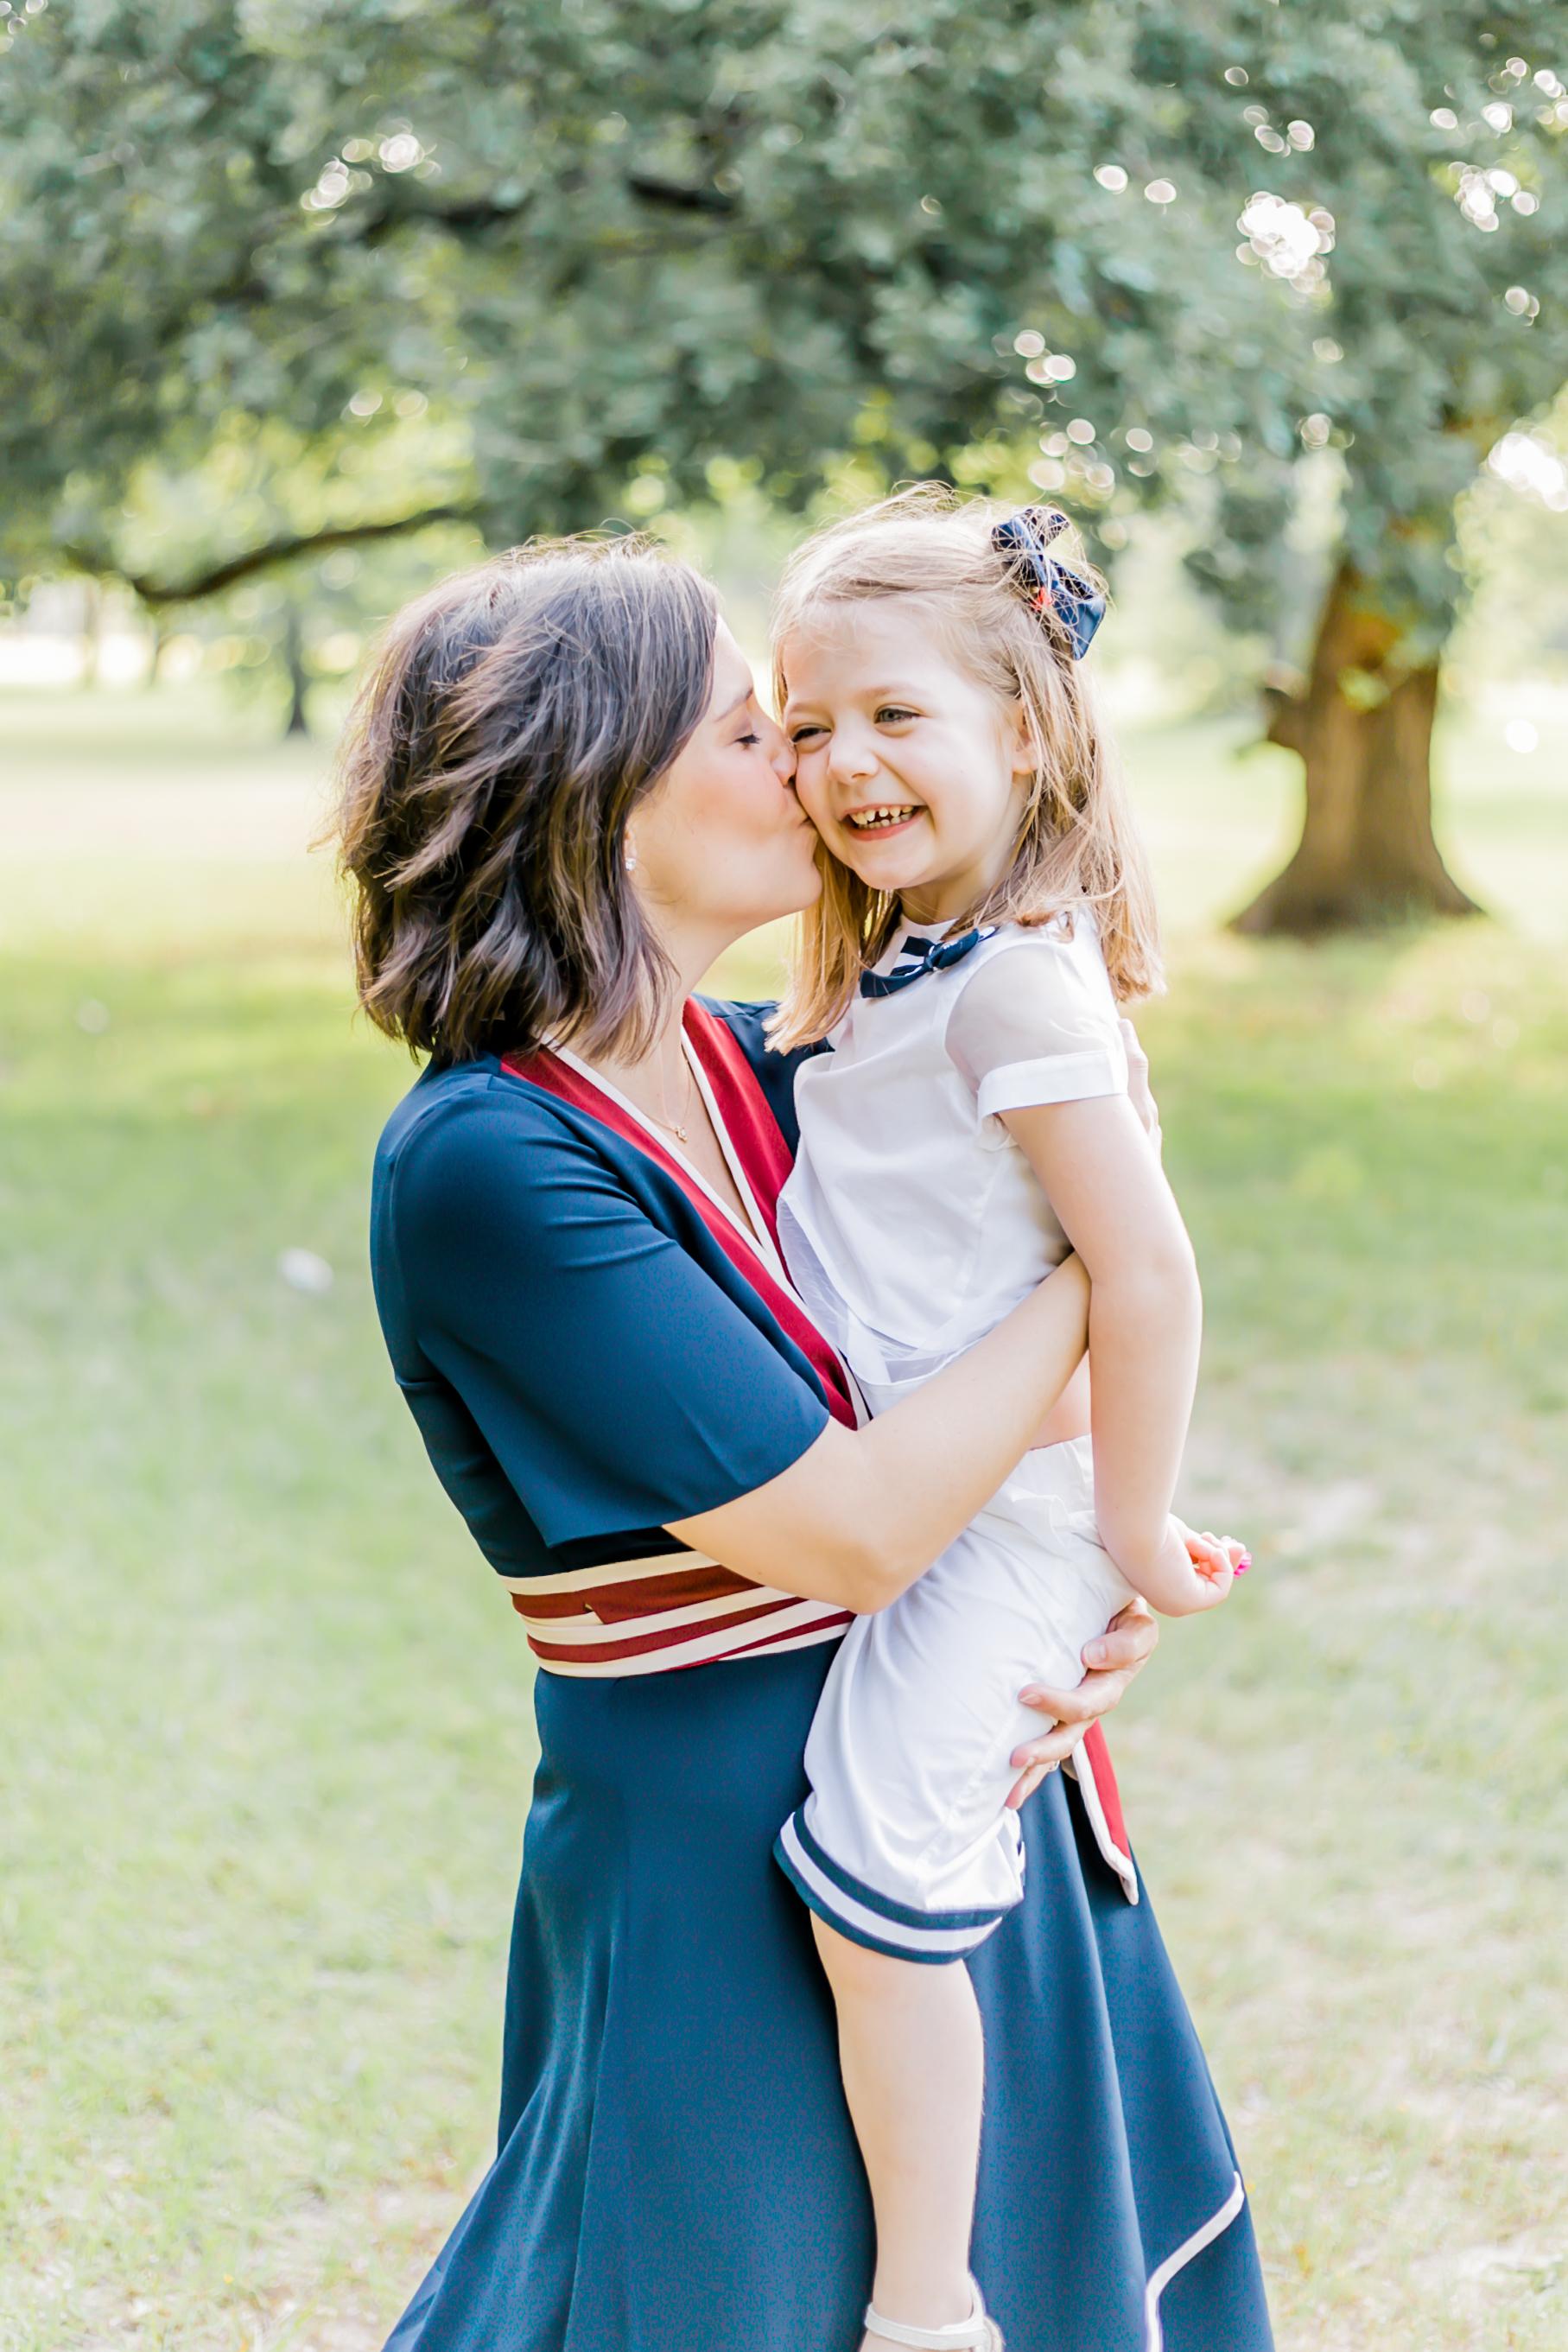 MothersDayMini-Blog-Linkenauger-8.jpg